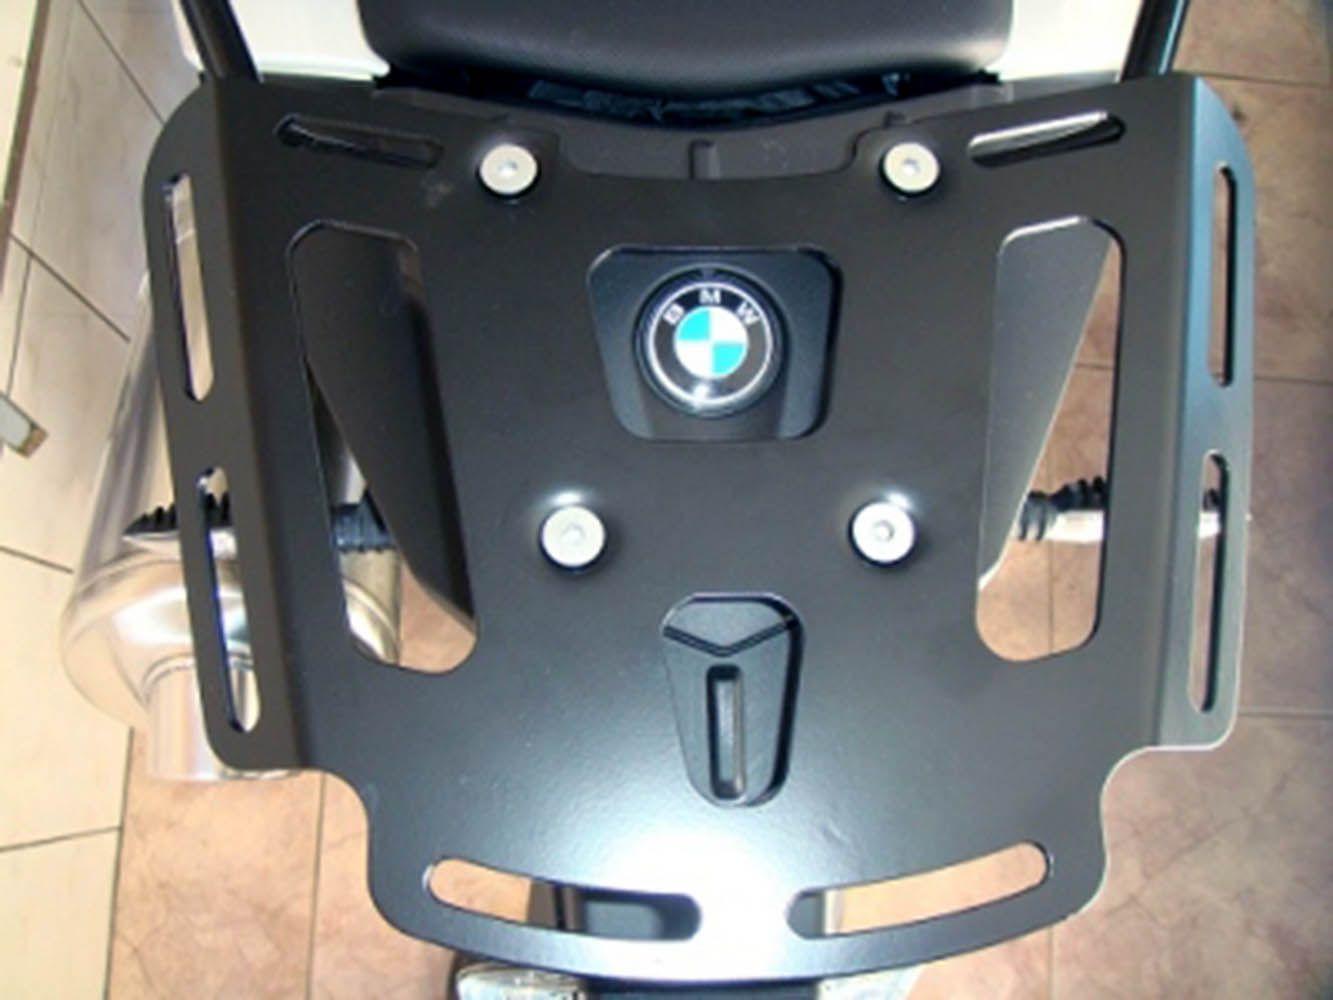 Chapa Bmw F 700 Gs / F 800 Gs Preto Fosco Chapam 8214